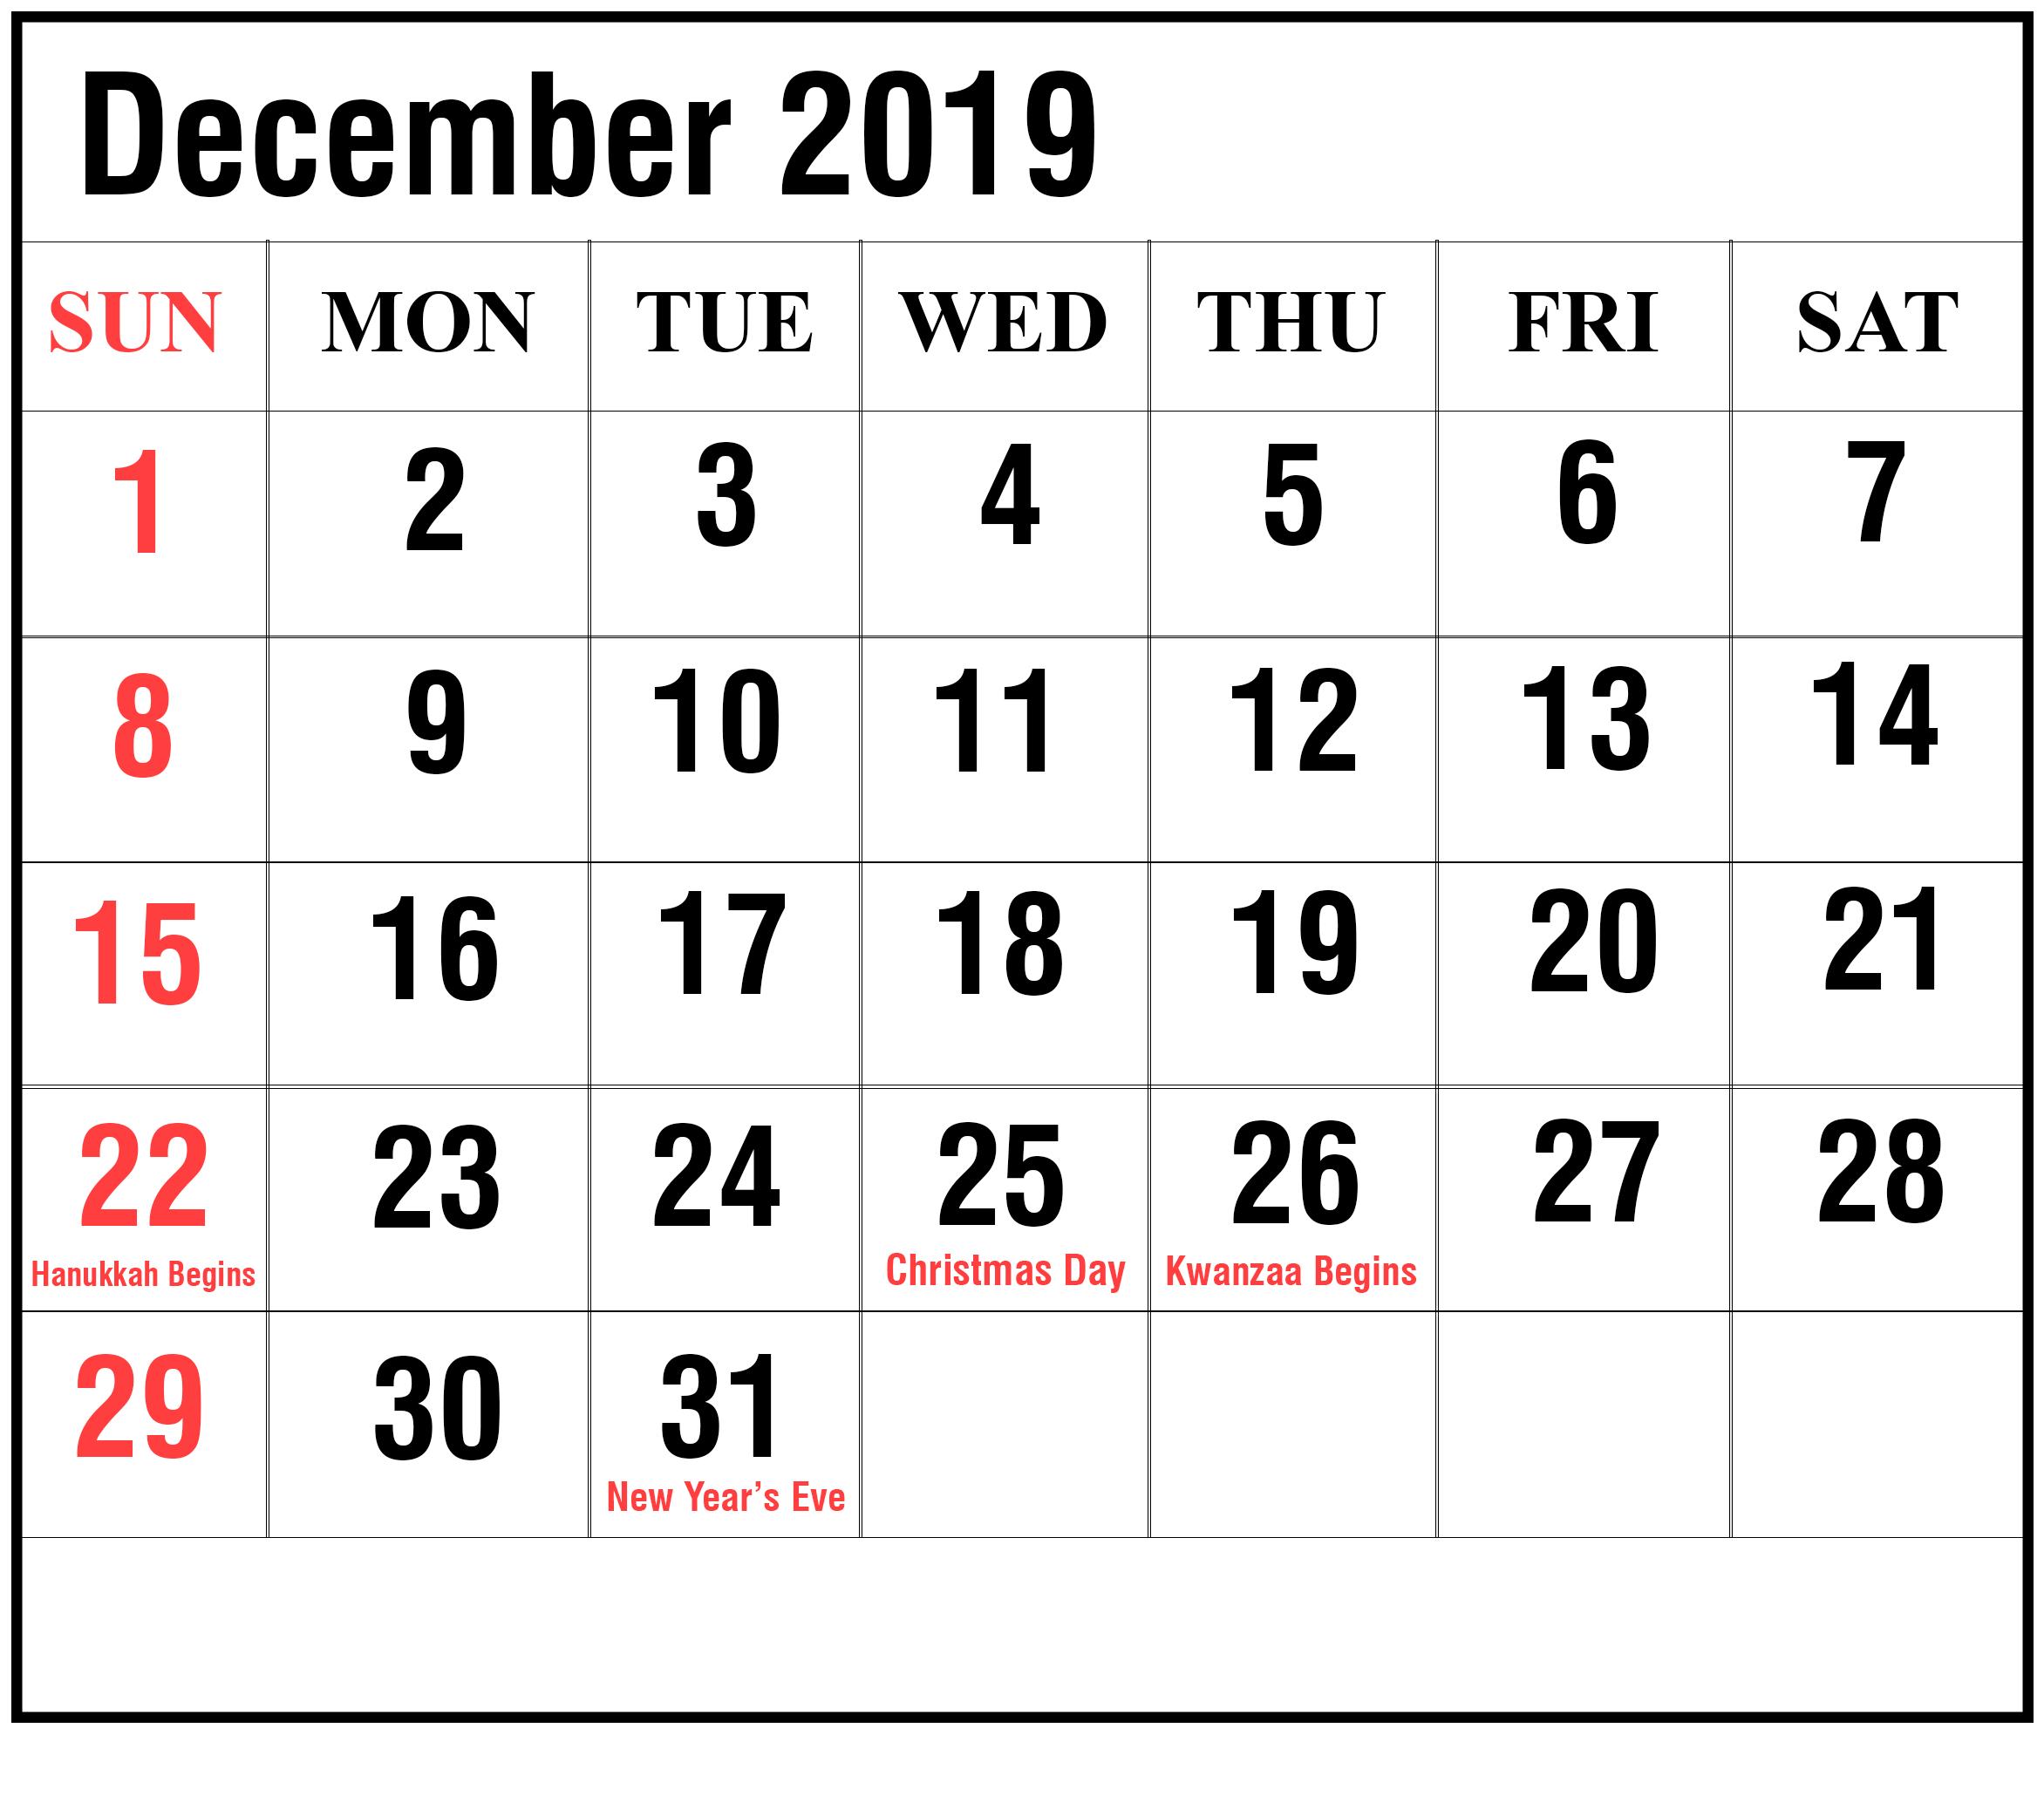 2019 December Calendar Weekly Planner With Times Printable